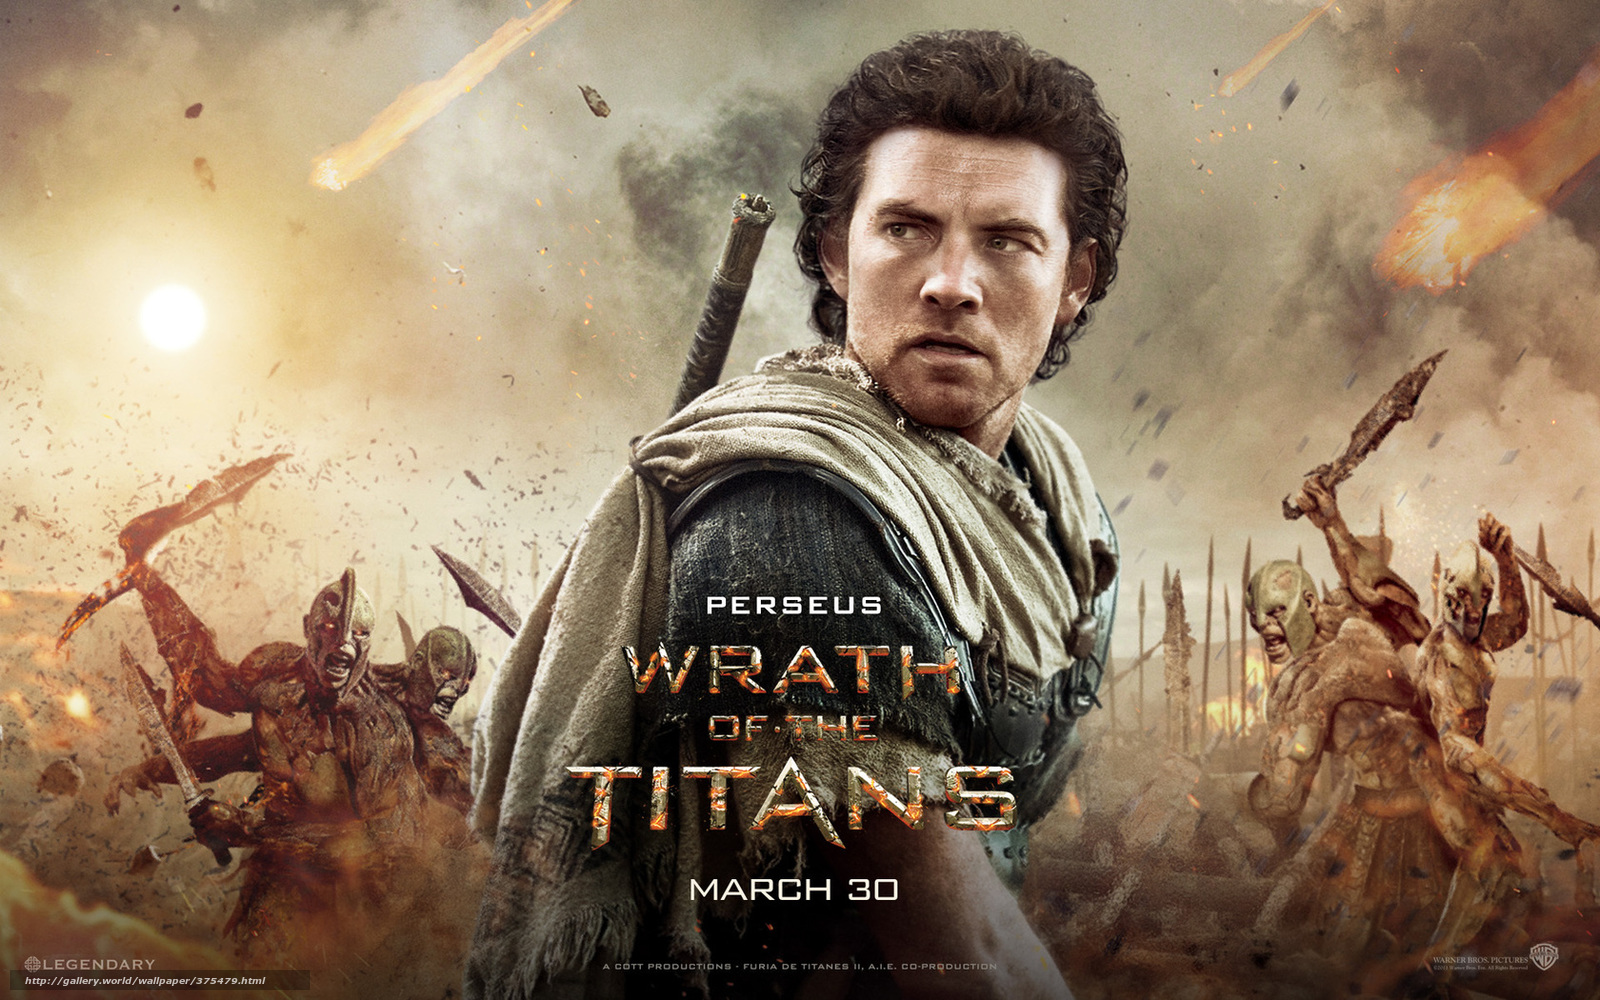 Wrath of the titans titans